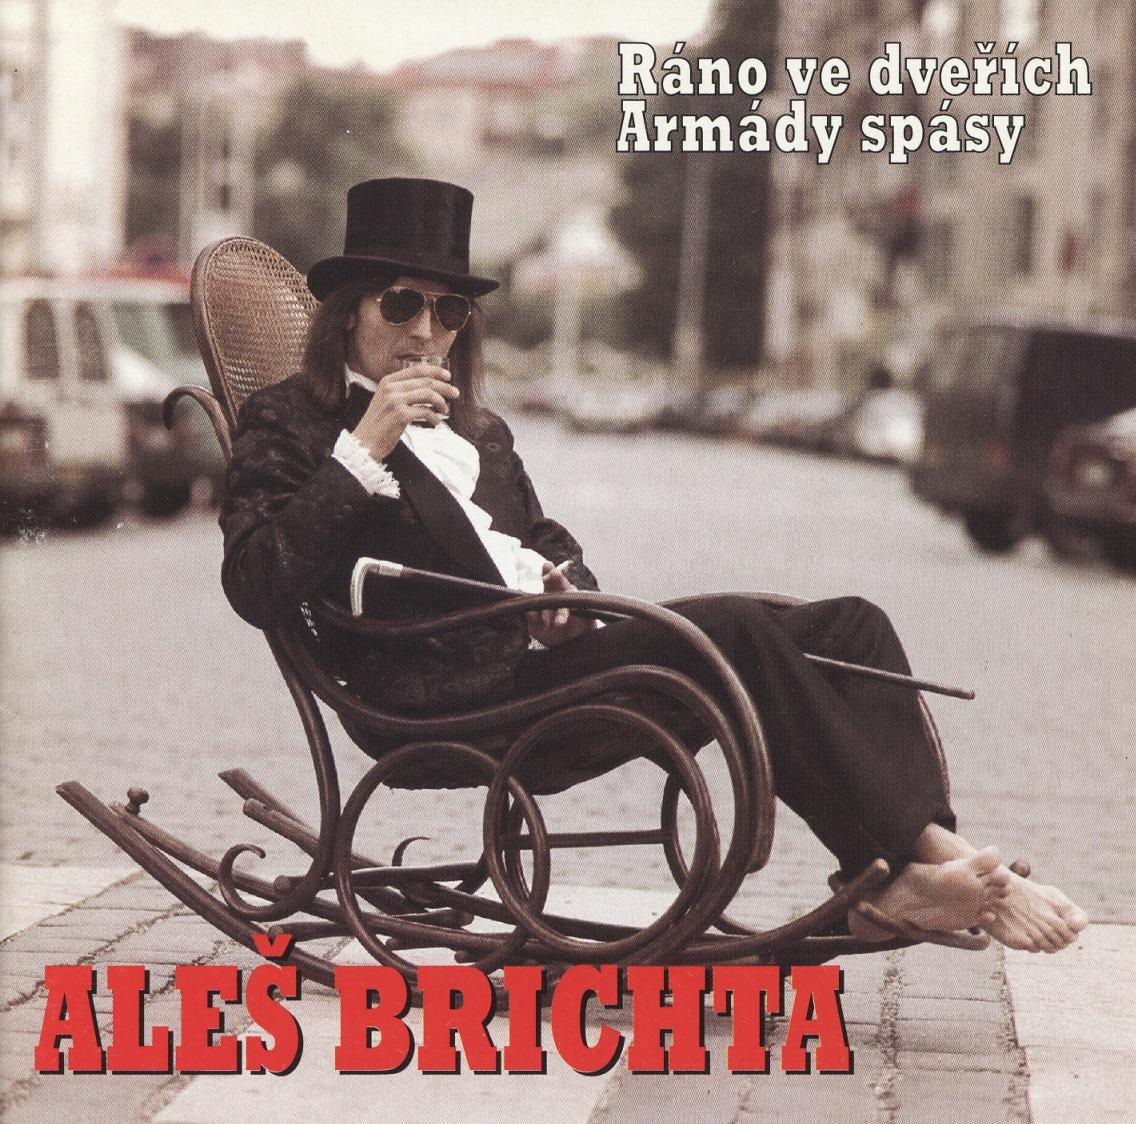 ALES BRICHTA (Czech Republic) / Rano Ve Dverich Armady Spasy